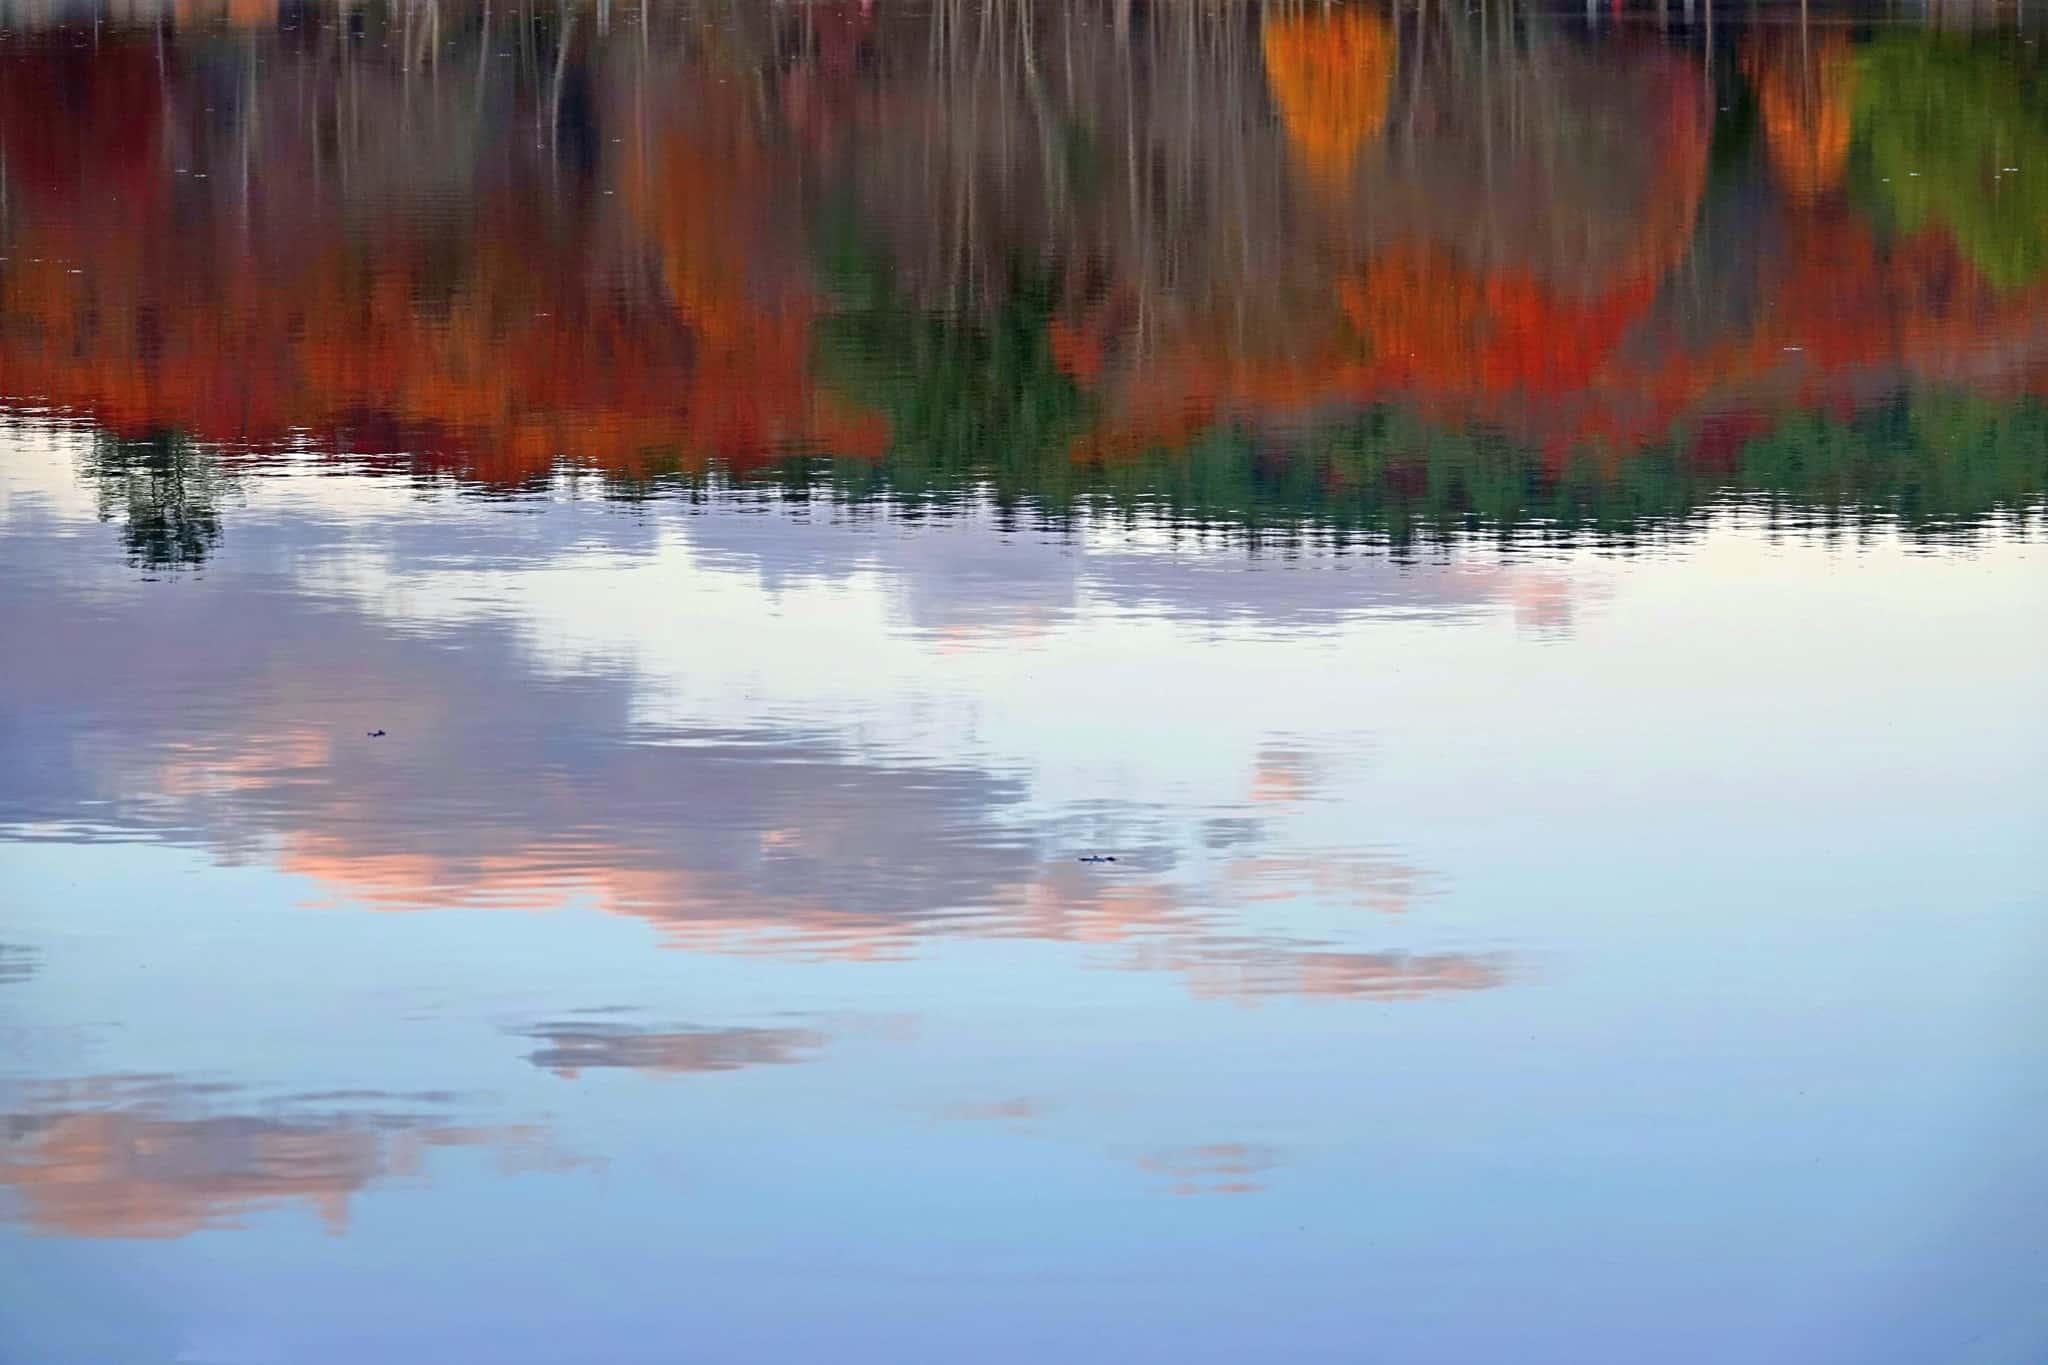 houghton pond reflection